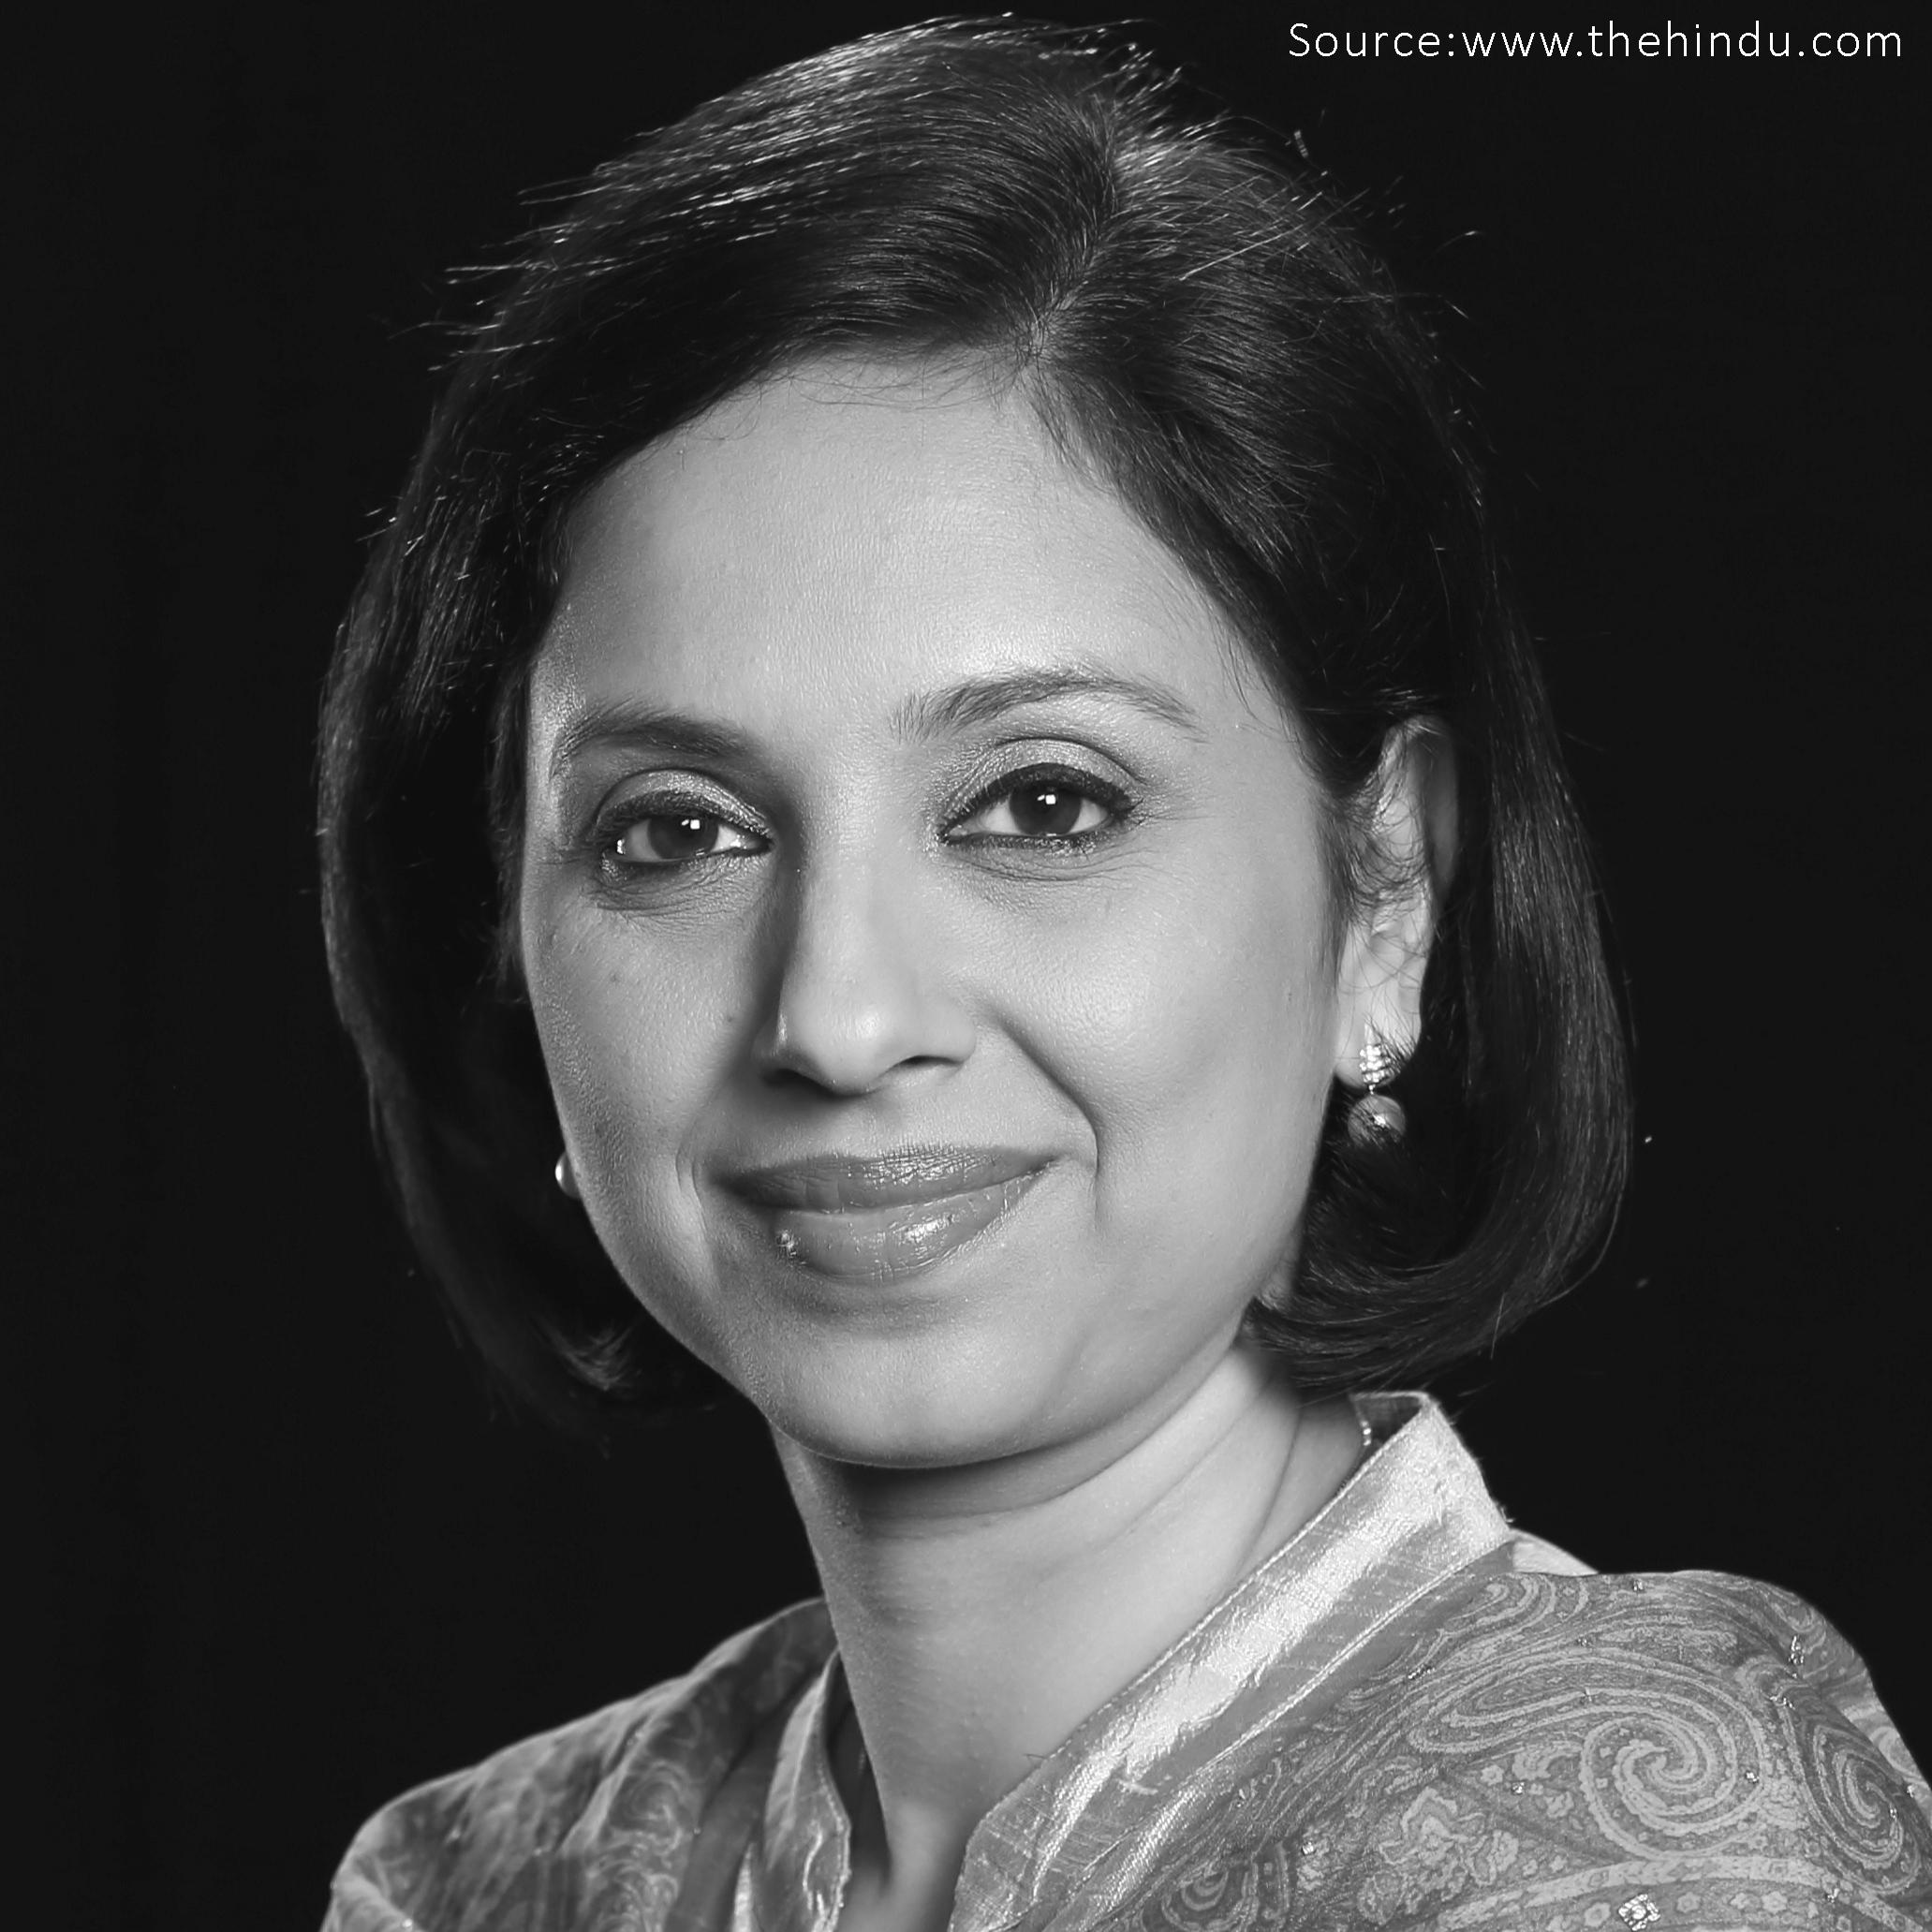 Suhasini Haider